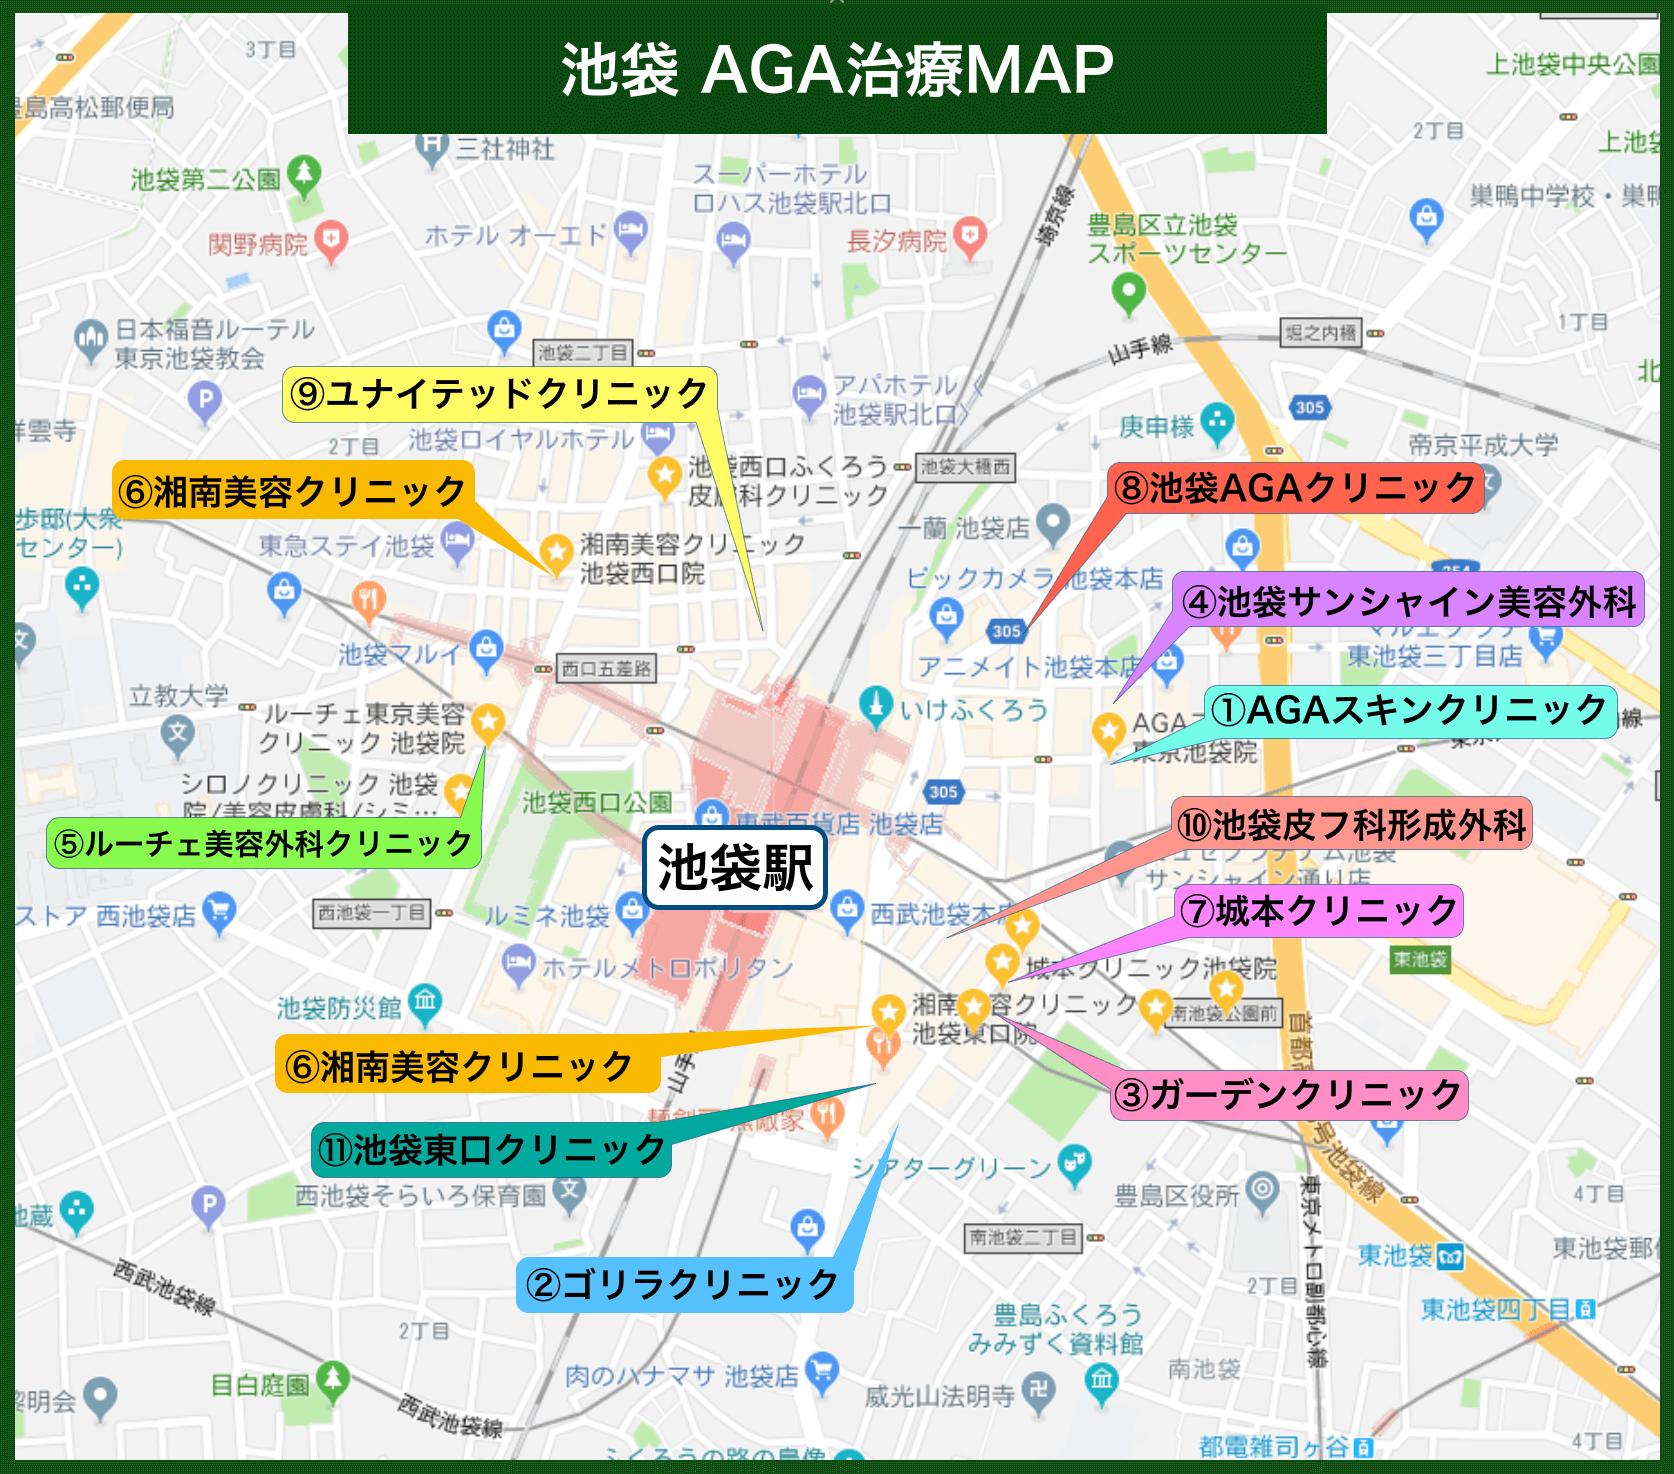 池袋AGA治療MAP(2019年版)